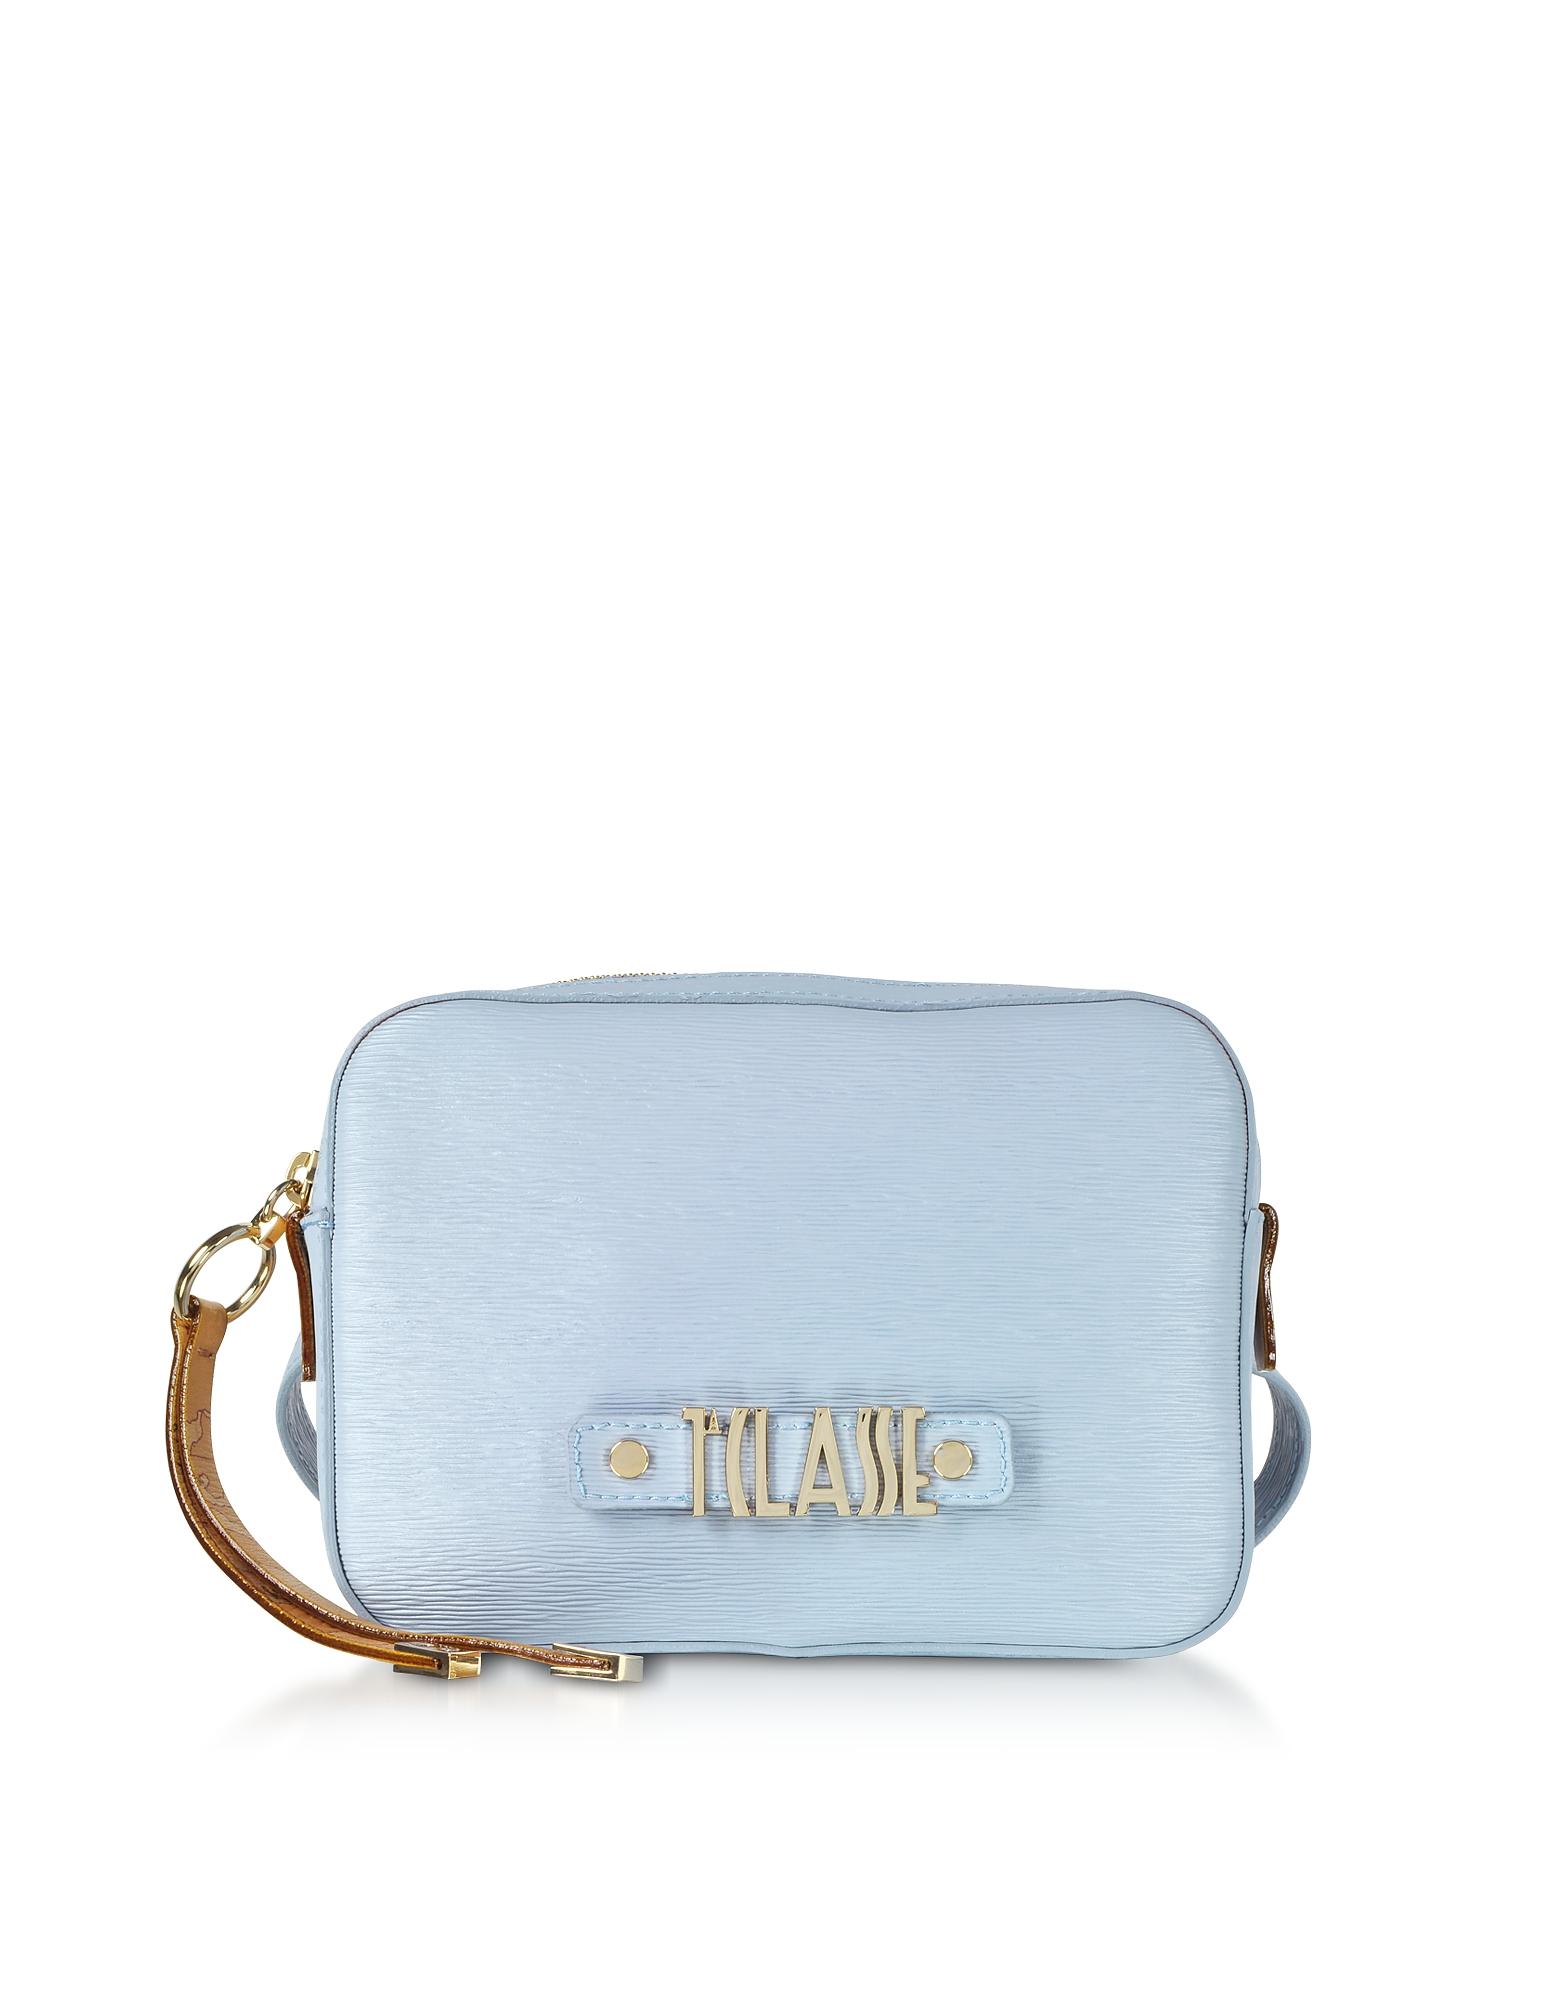 Alviero Martini 1A Classe Handbags, Alegria Smile Belt Bag